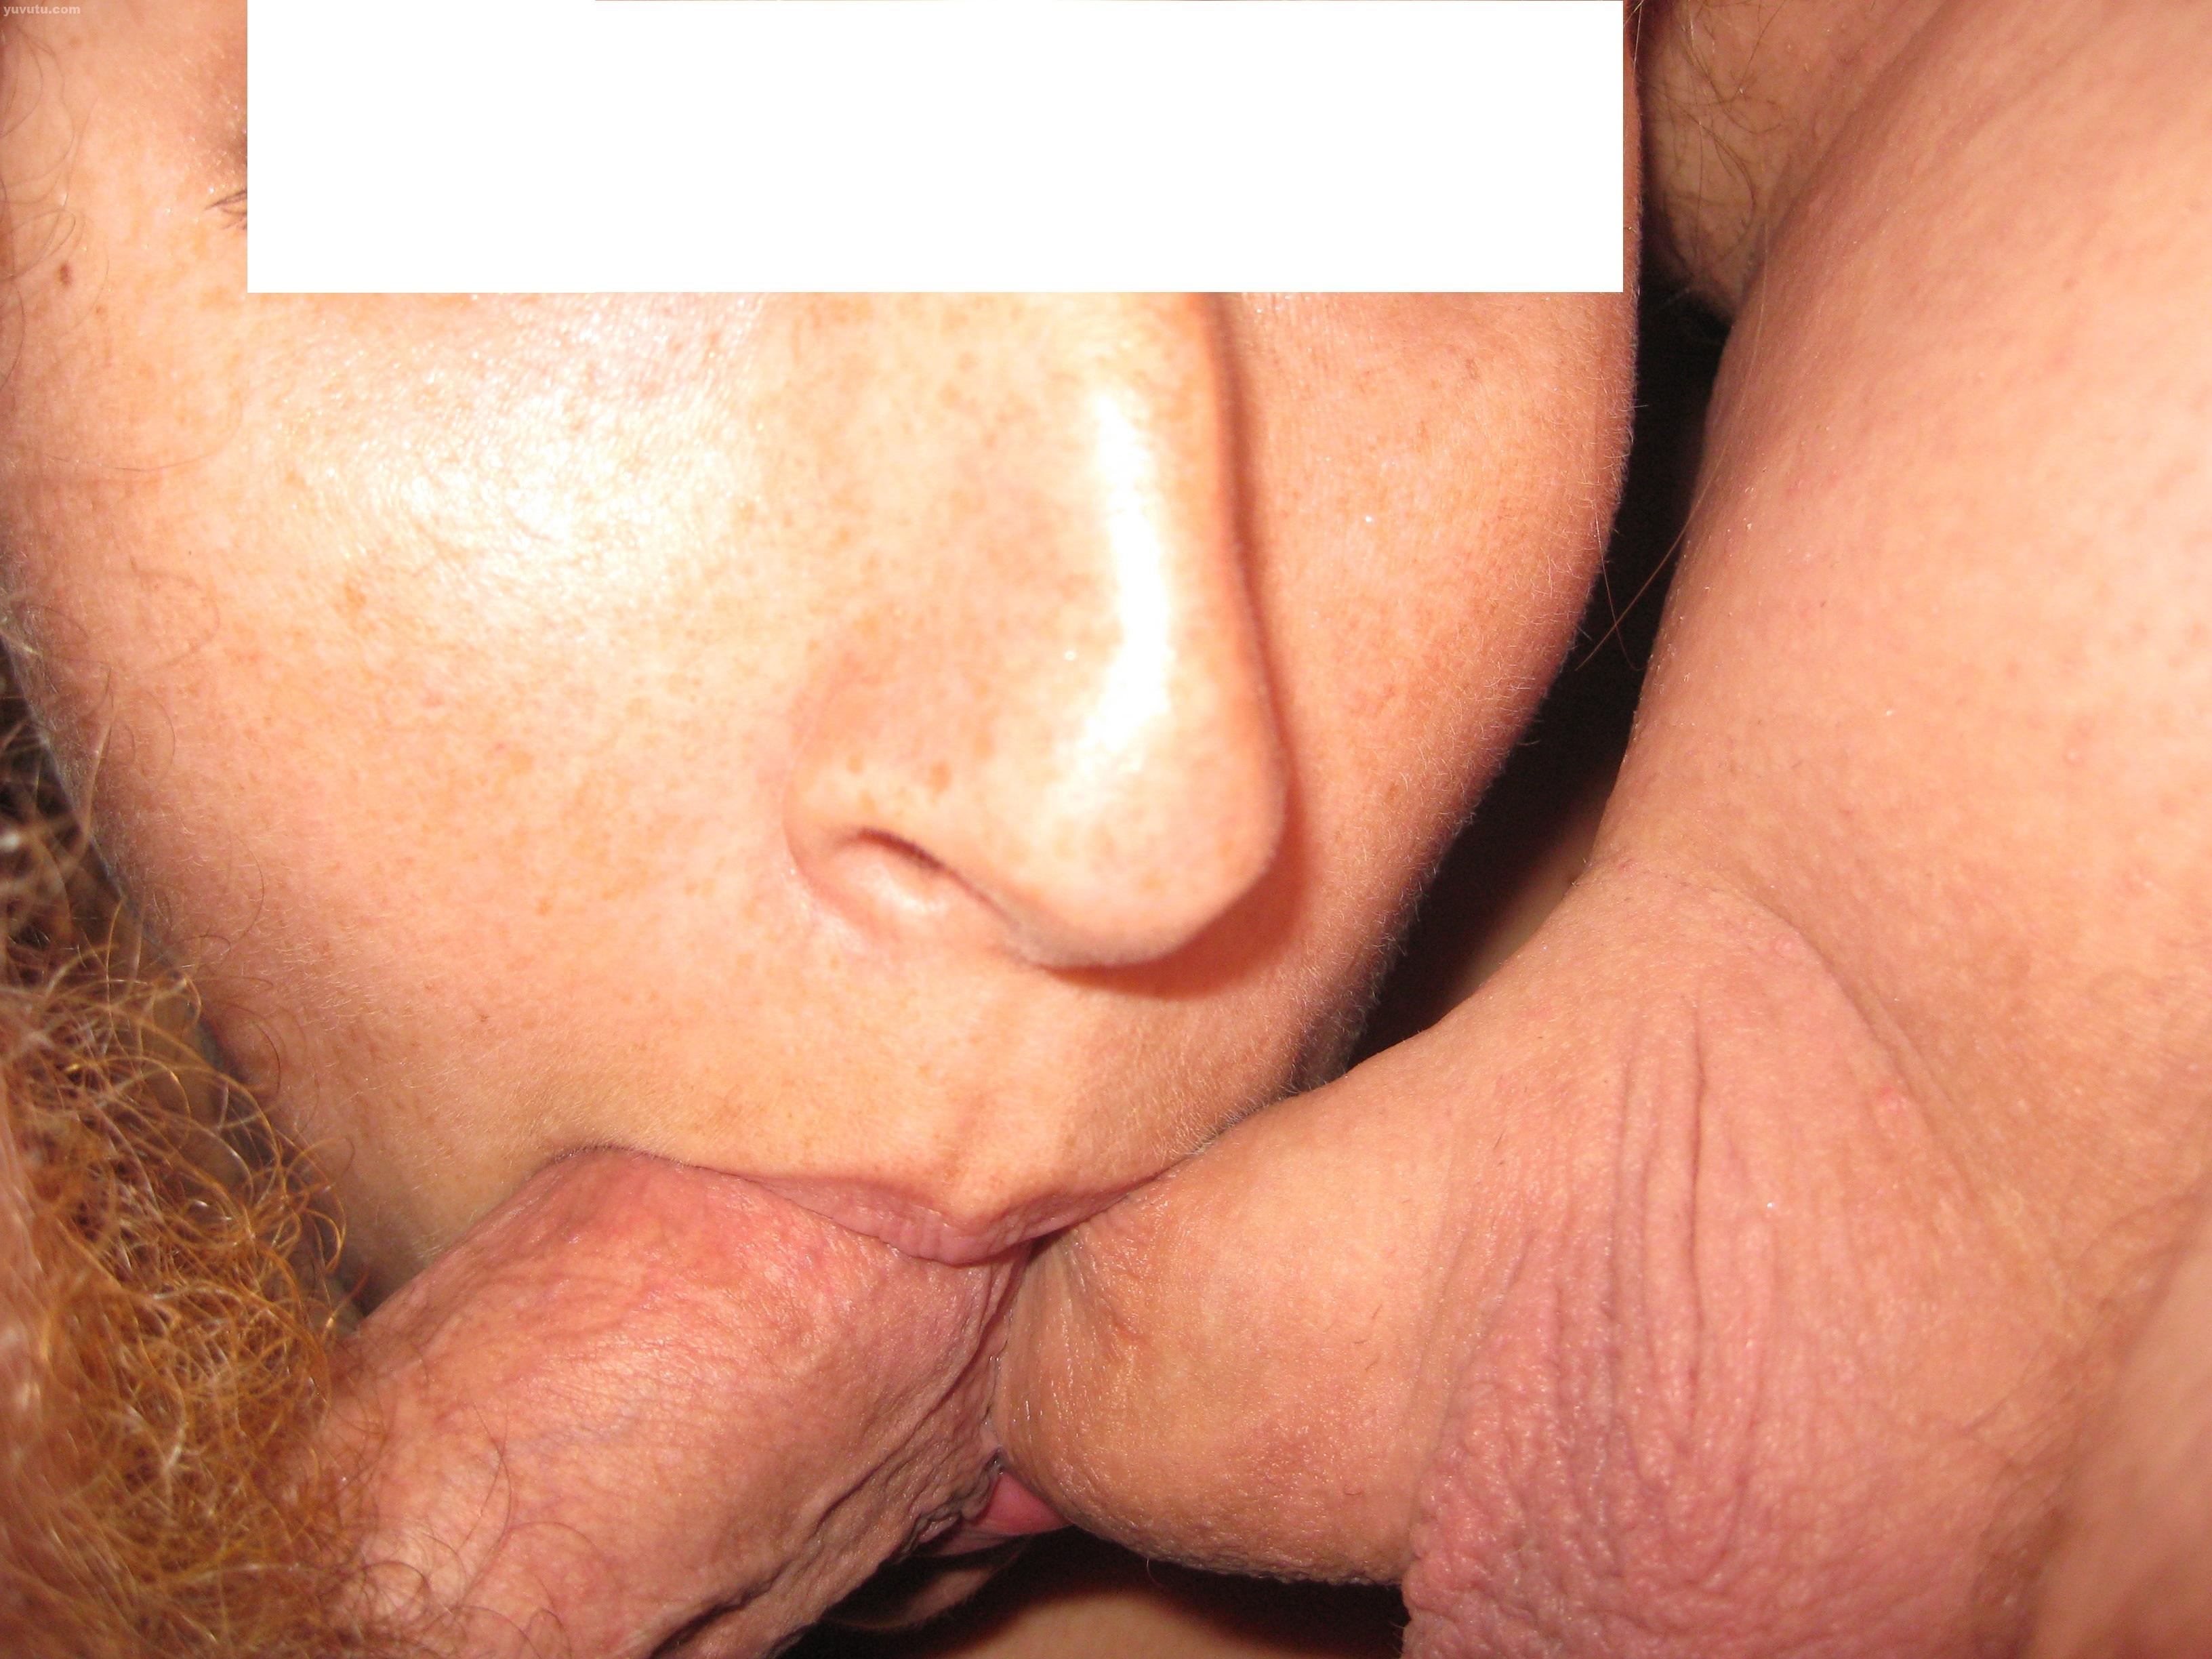 Streaming deepthroat blowjob videos